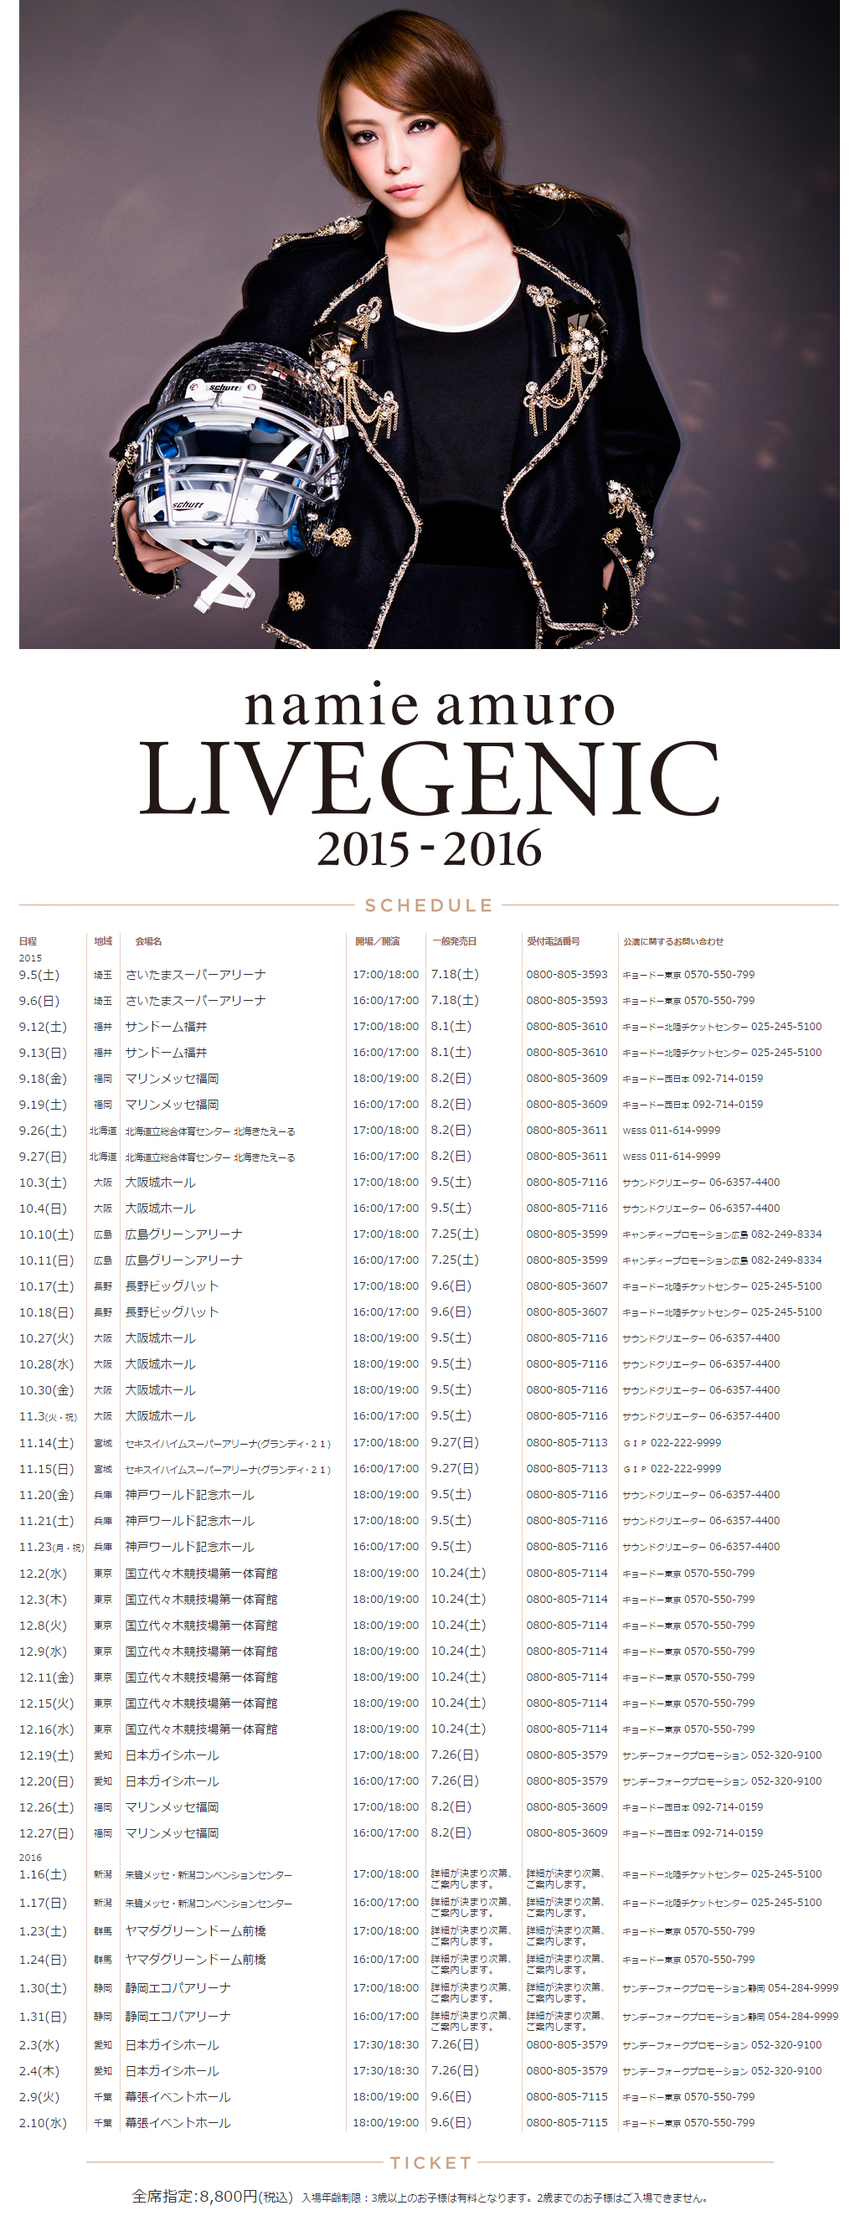 Namie Amuro livegenic 2015 2016